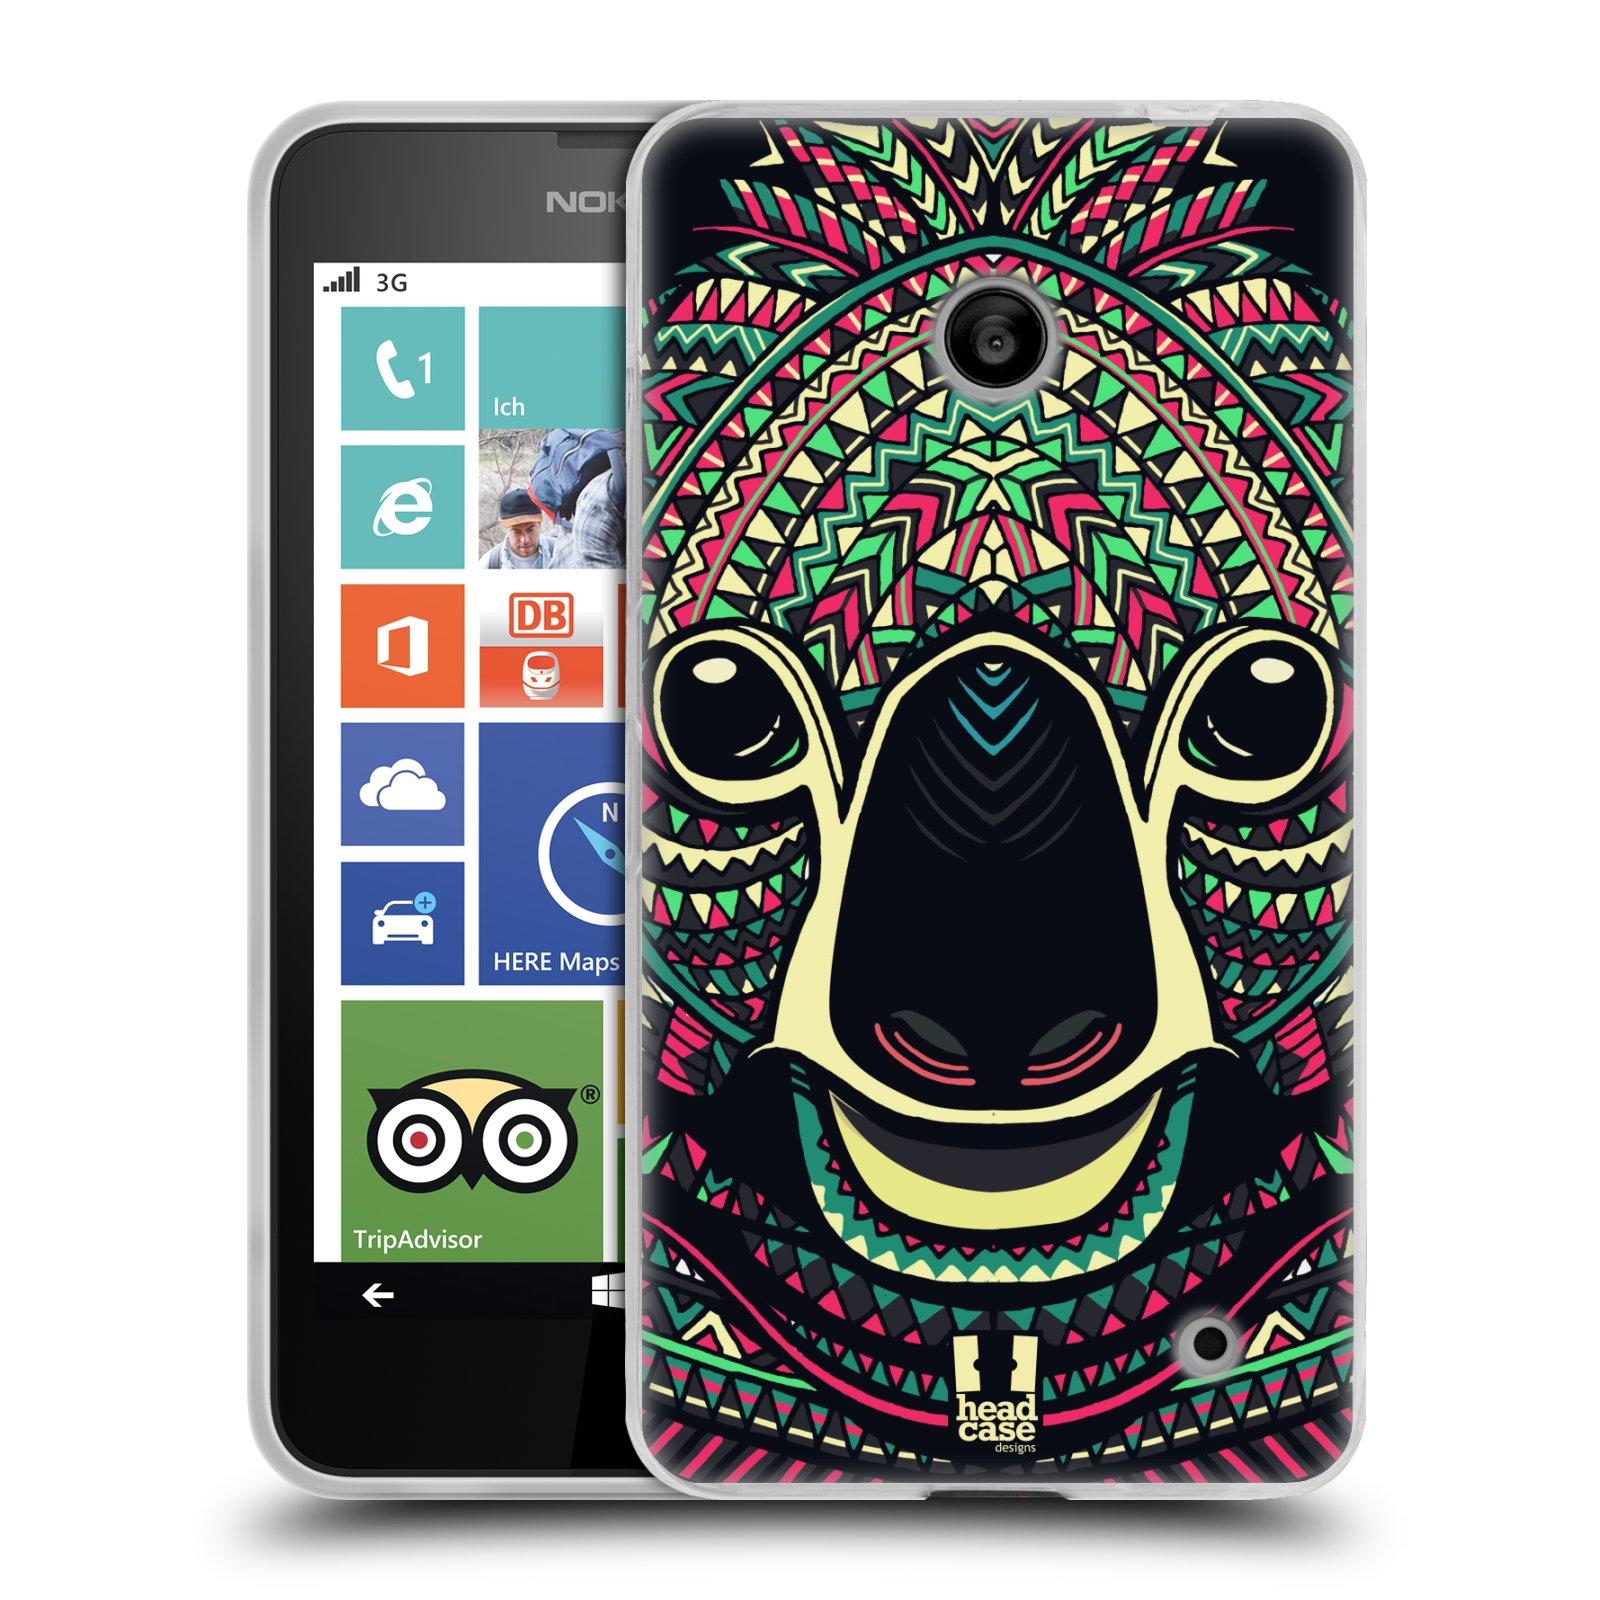 Silikonové pouzdro na mobil Nokia Lumia 630 HEAD CASE AZTEC KOALA (Silikonový kryt či obal na mobilní telefon Nokia Lumia 630 a Nokia Lumia 630 Dual SIM)